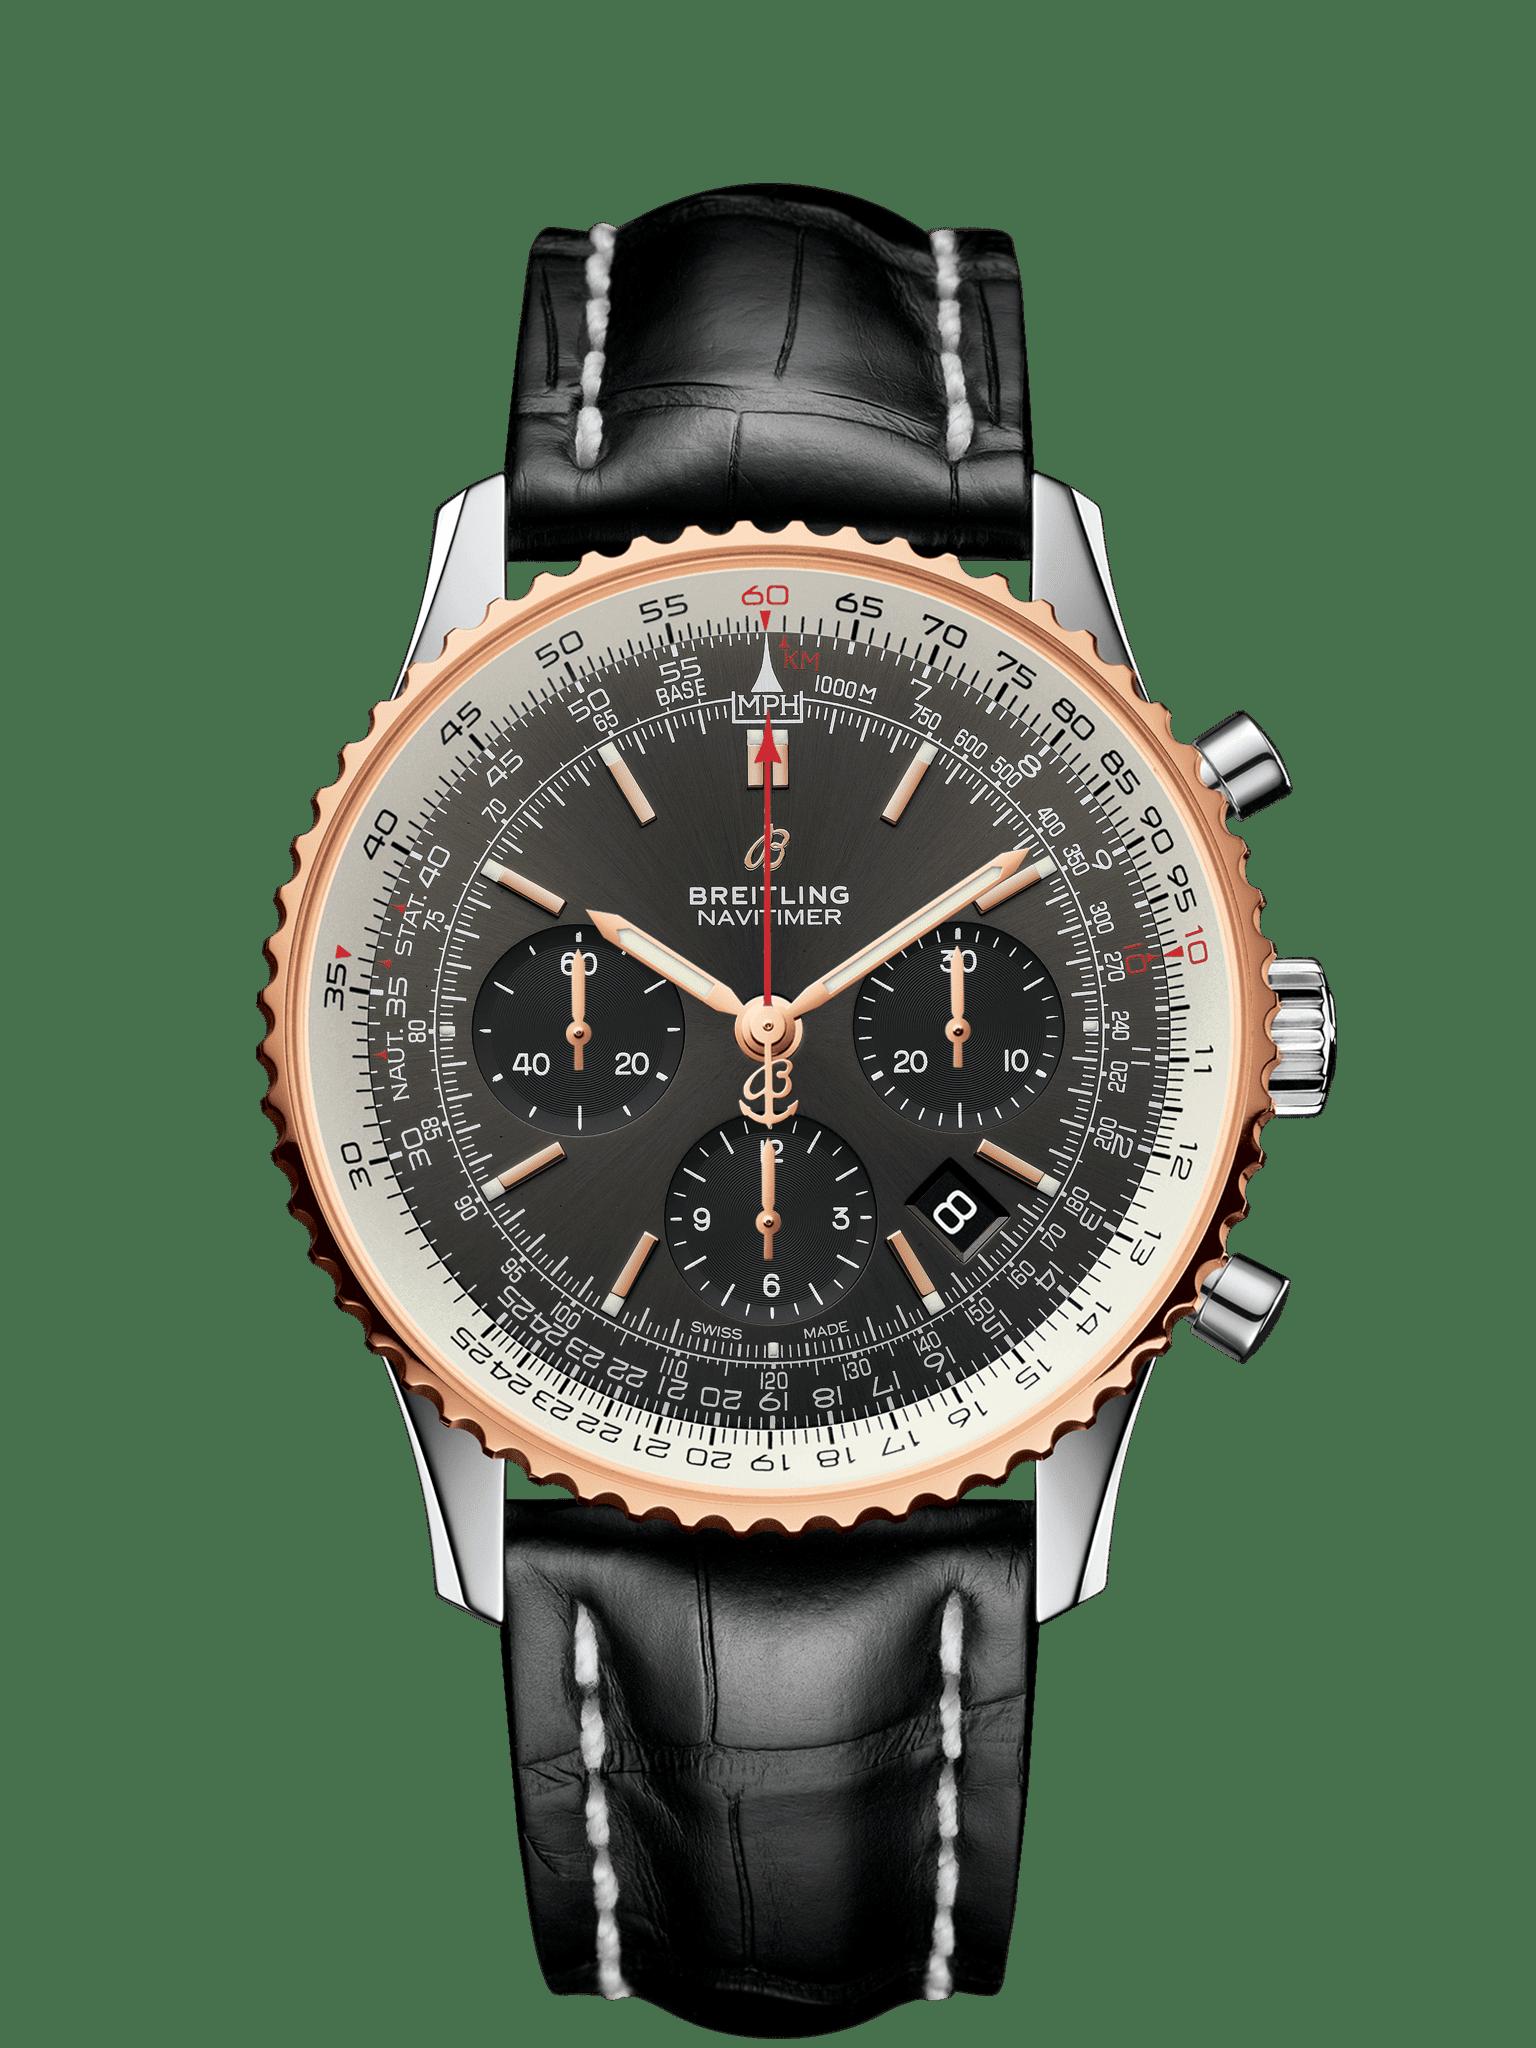 Philips Watches Replica